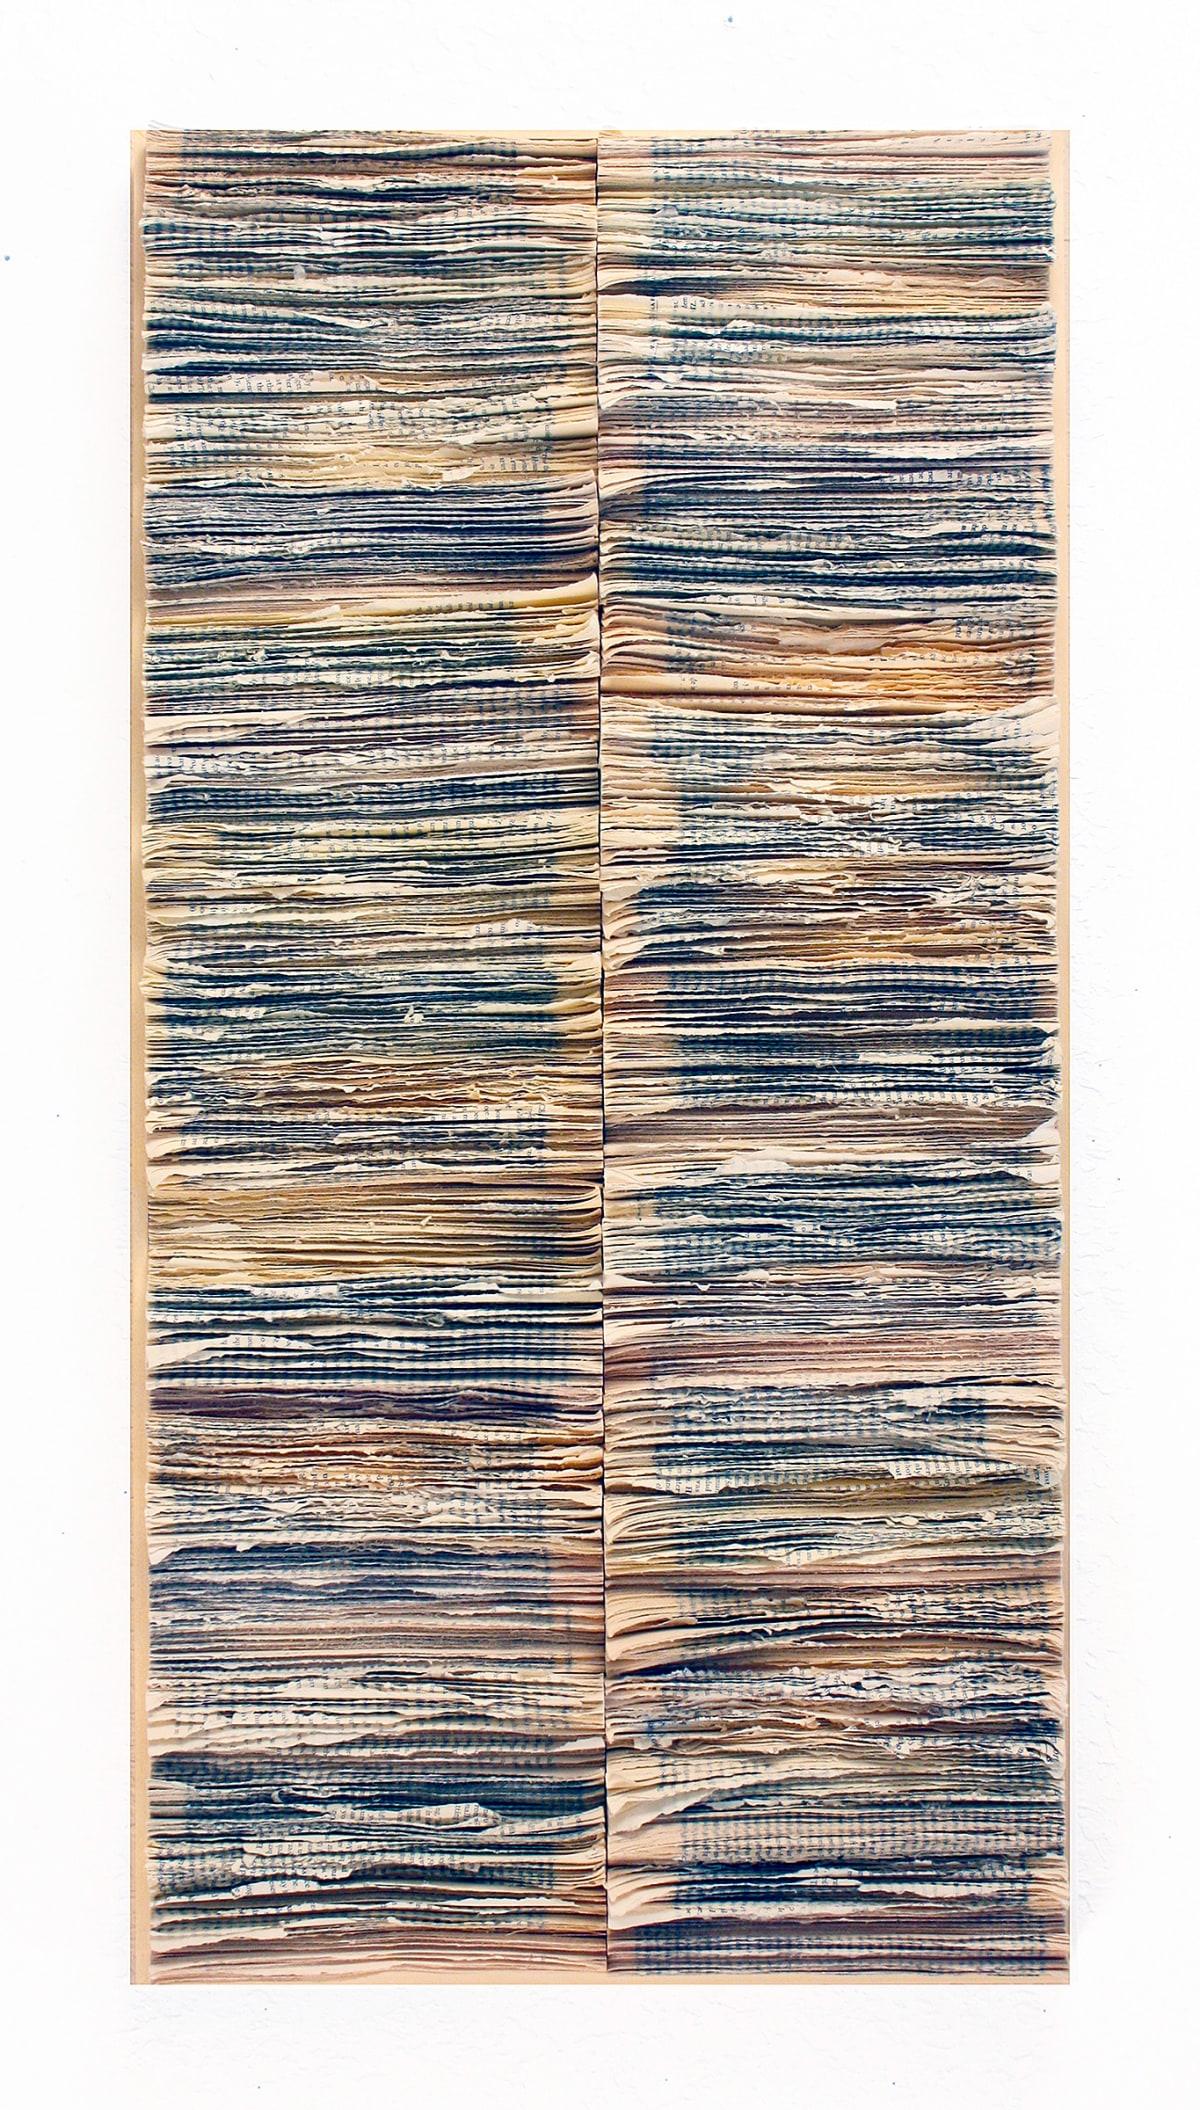 Jessica Drenk, Spine 5, 2019